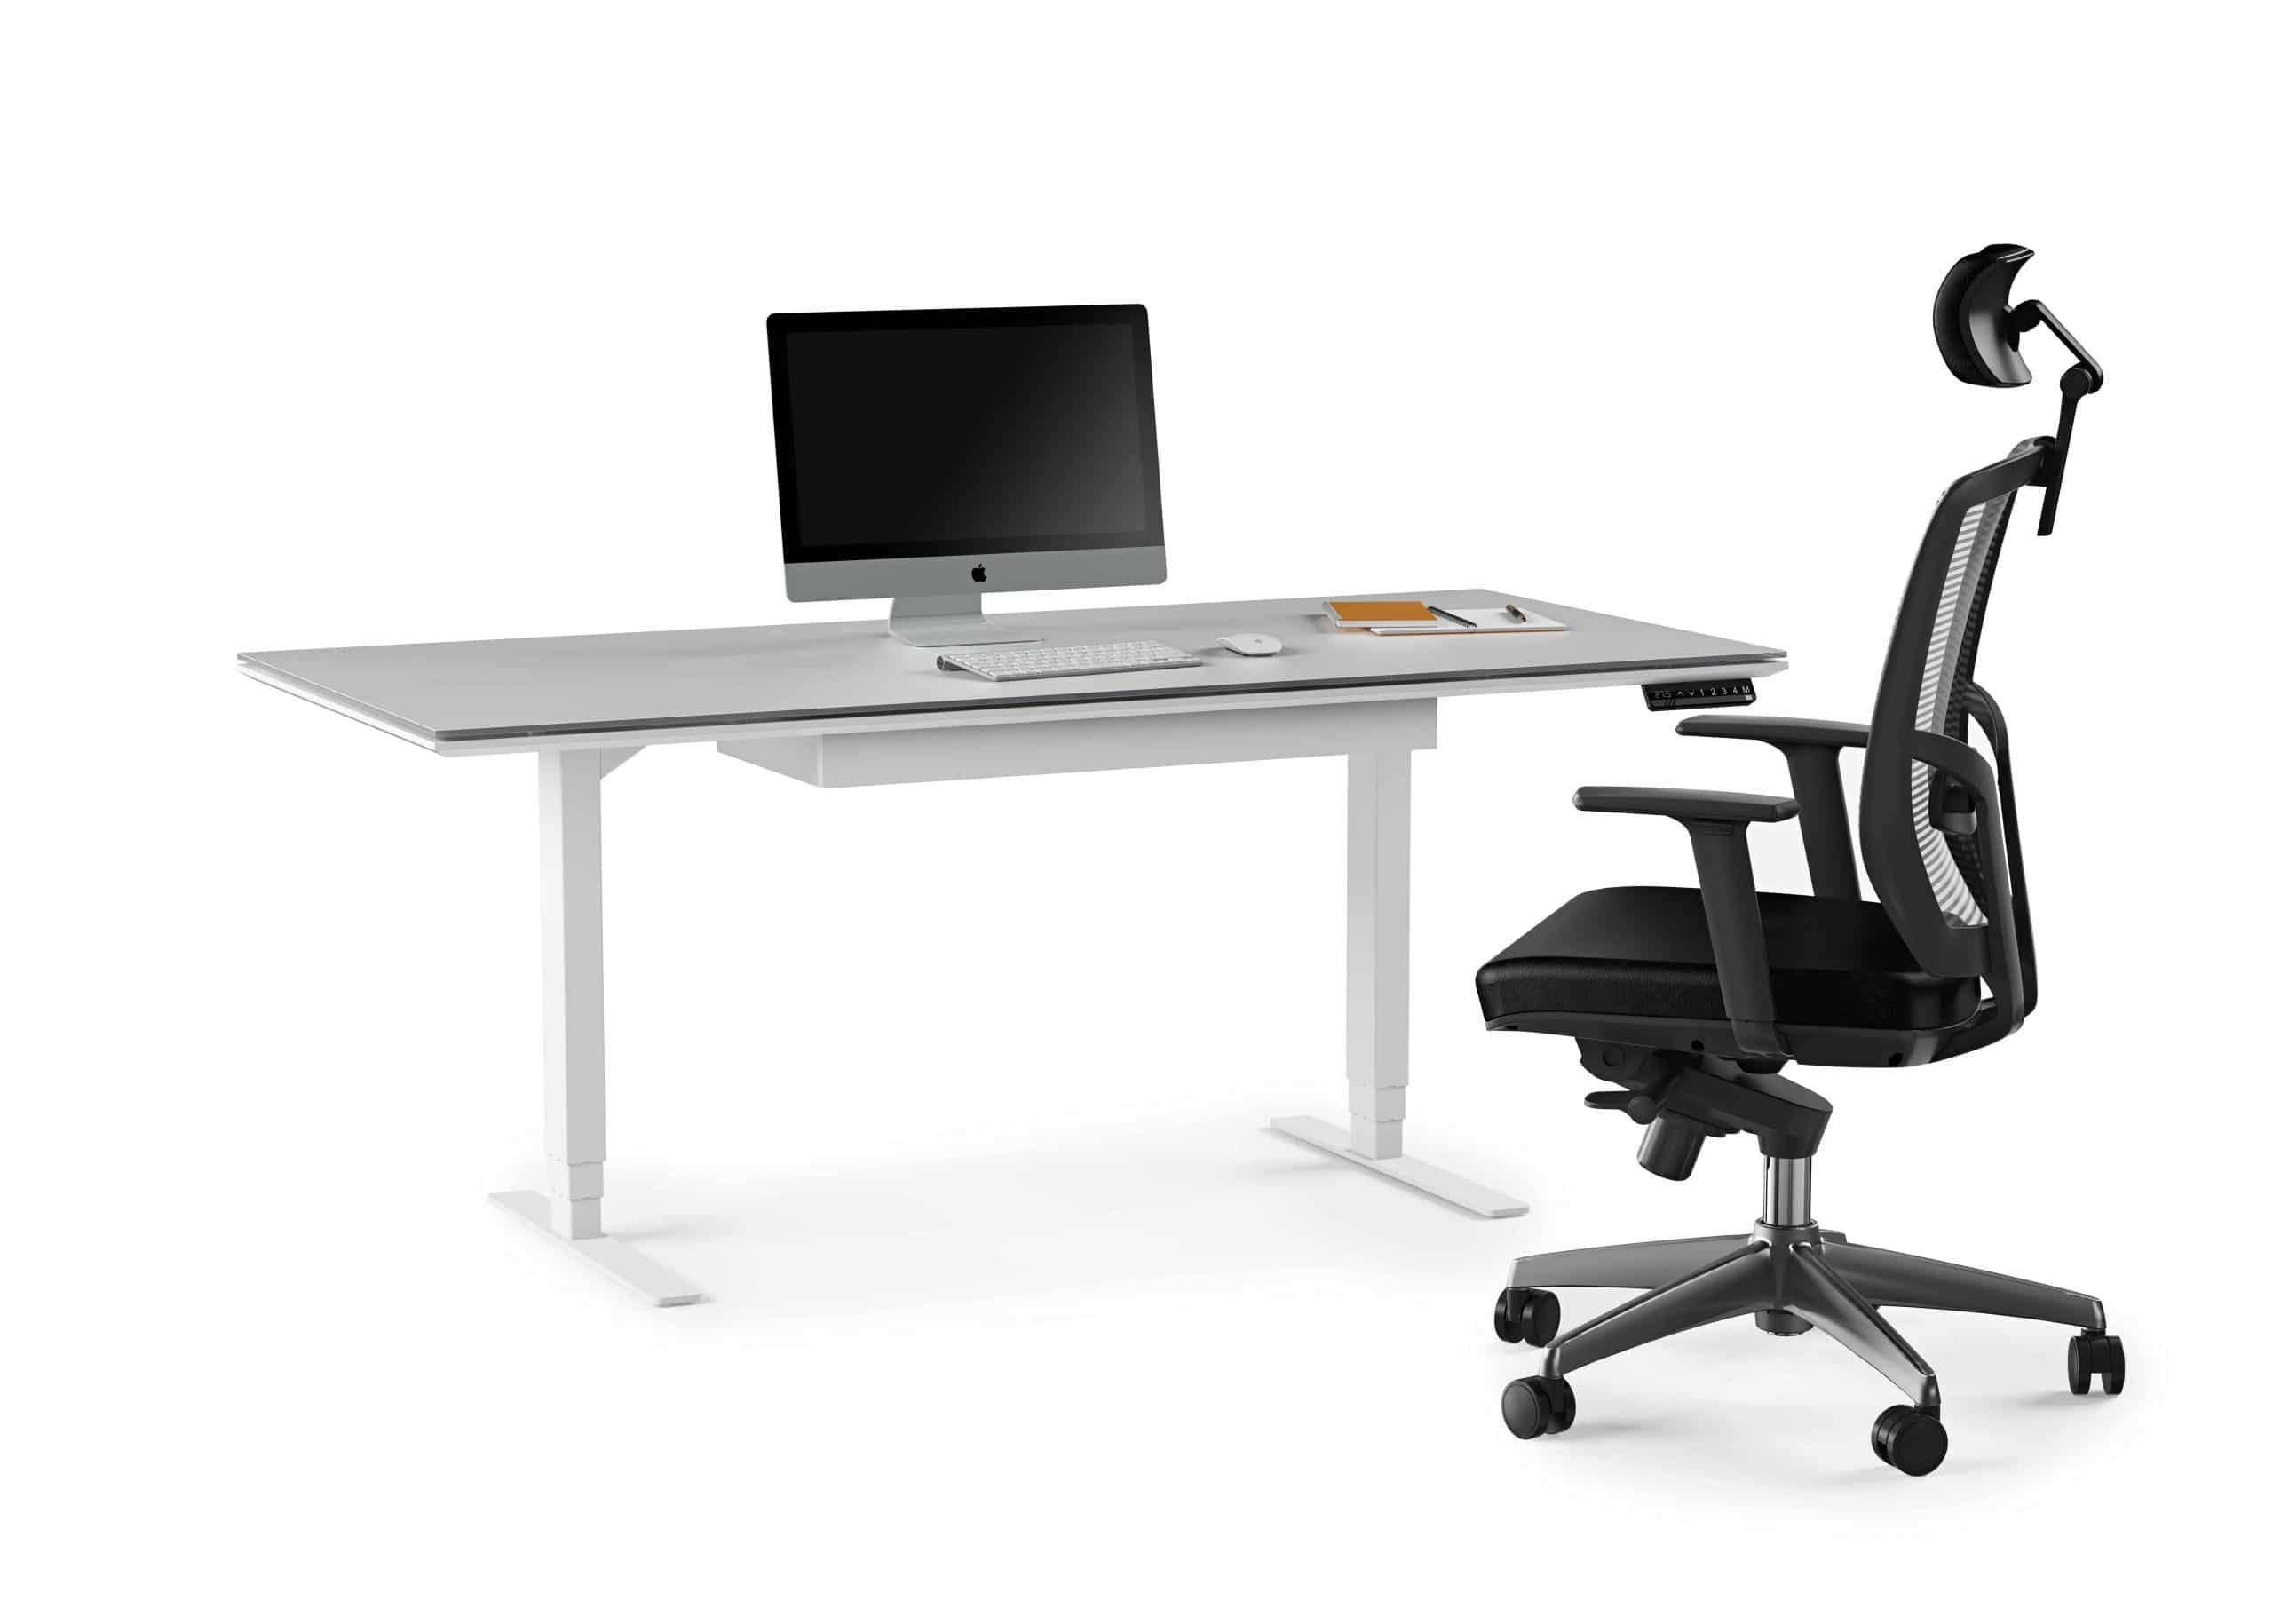 centro-office-64526459-BDI-height-adjustable-TC223-white-1